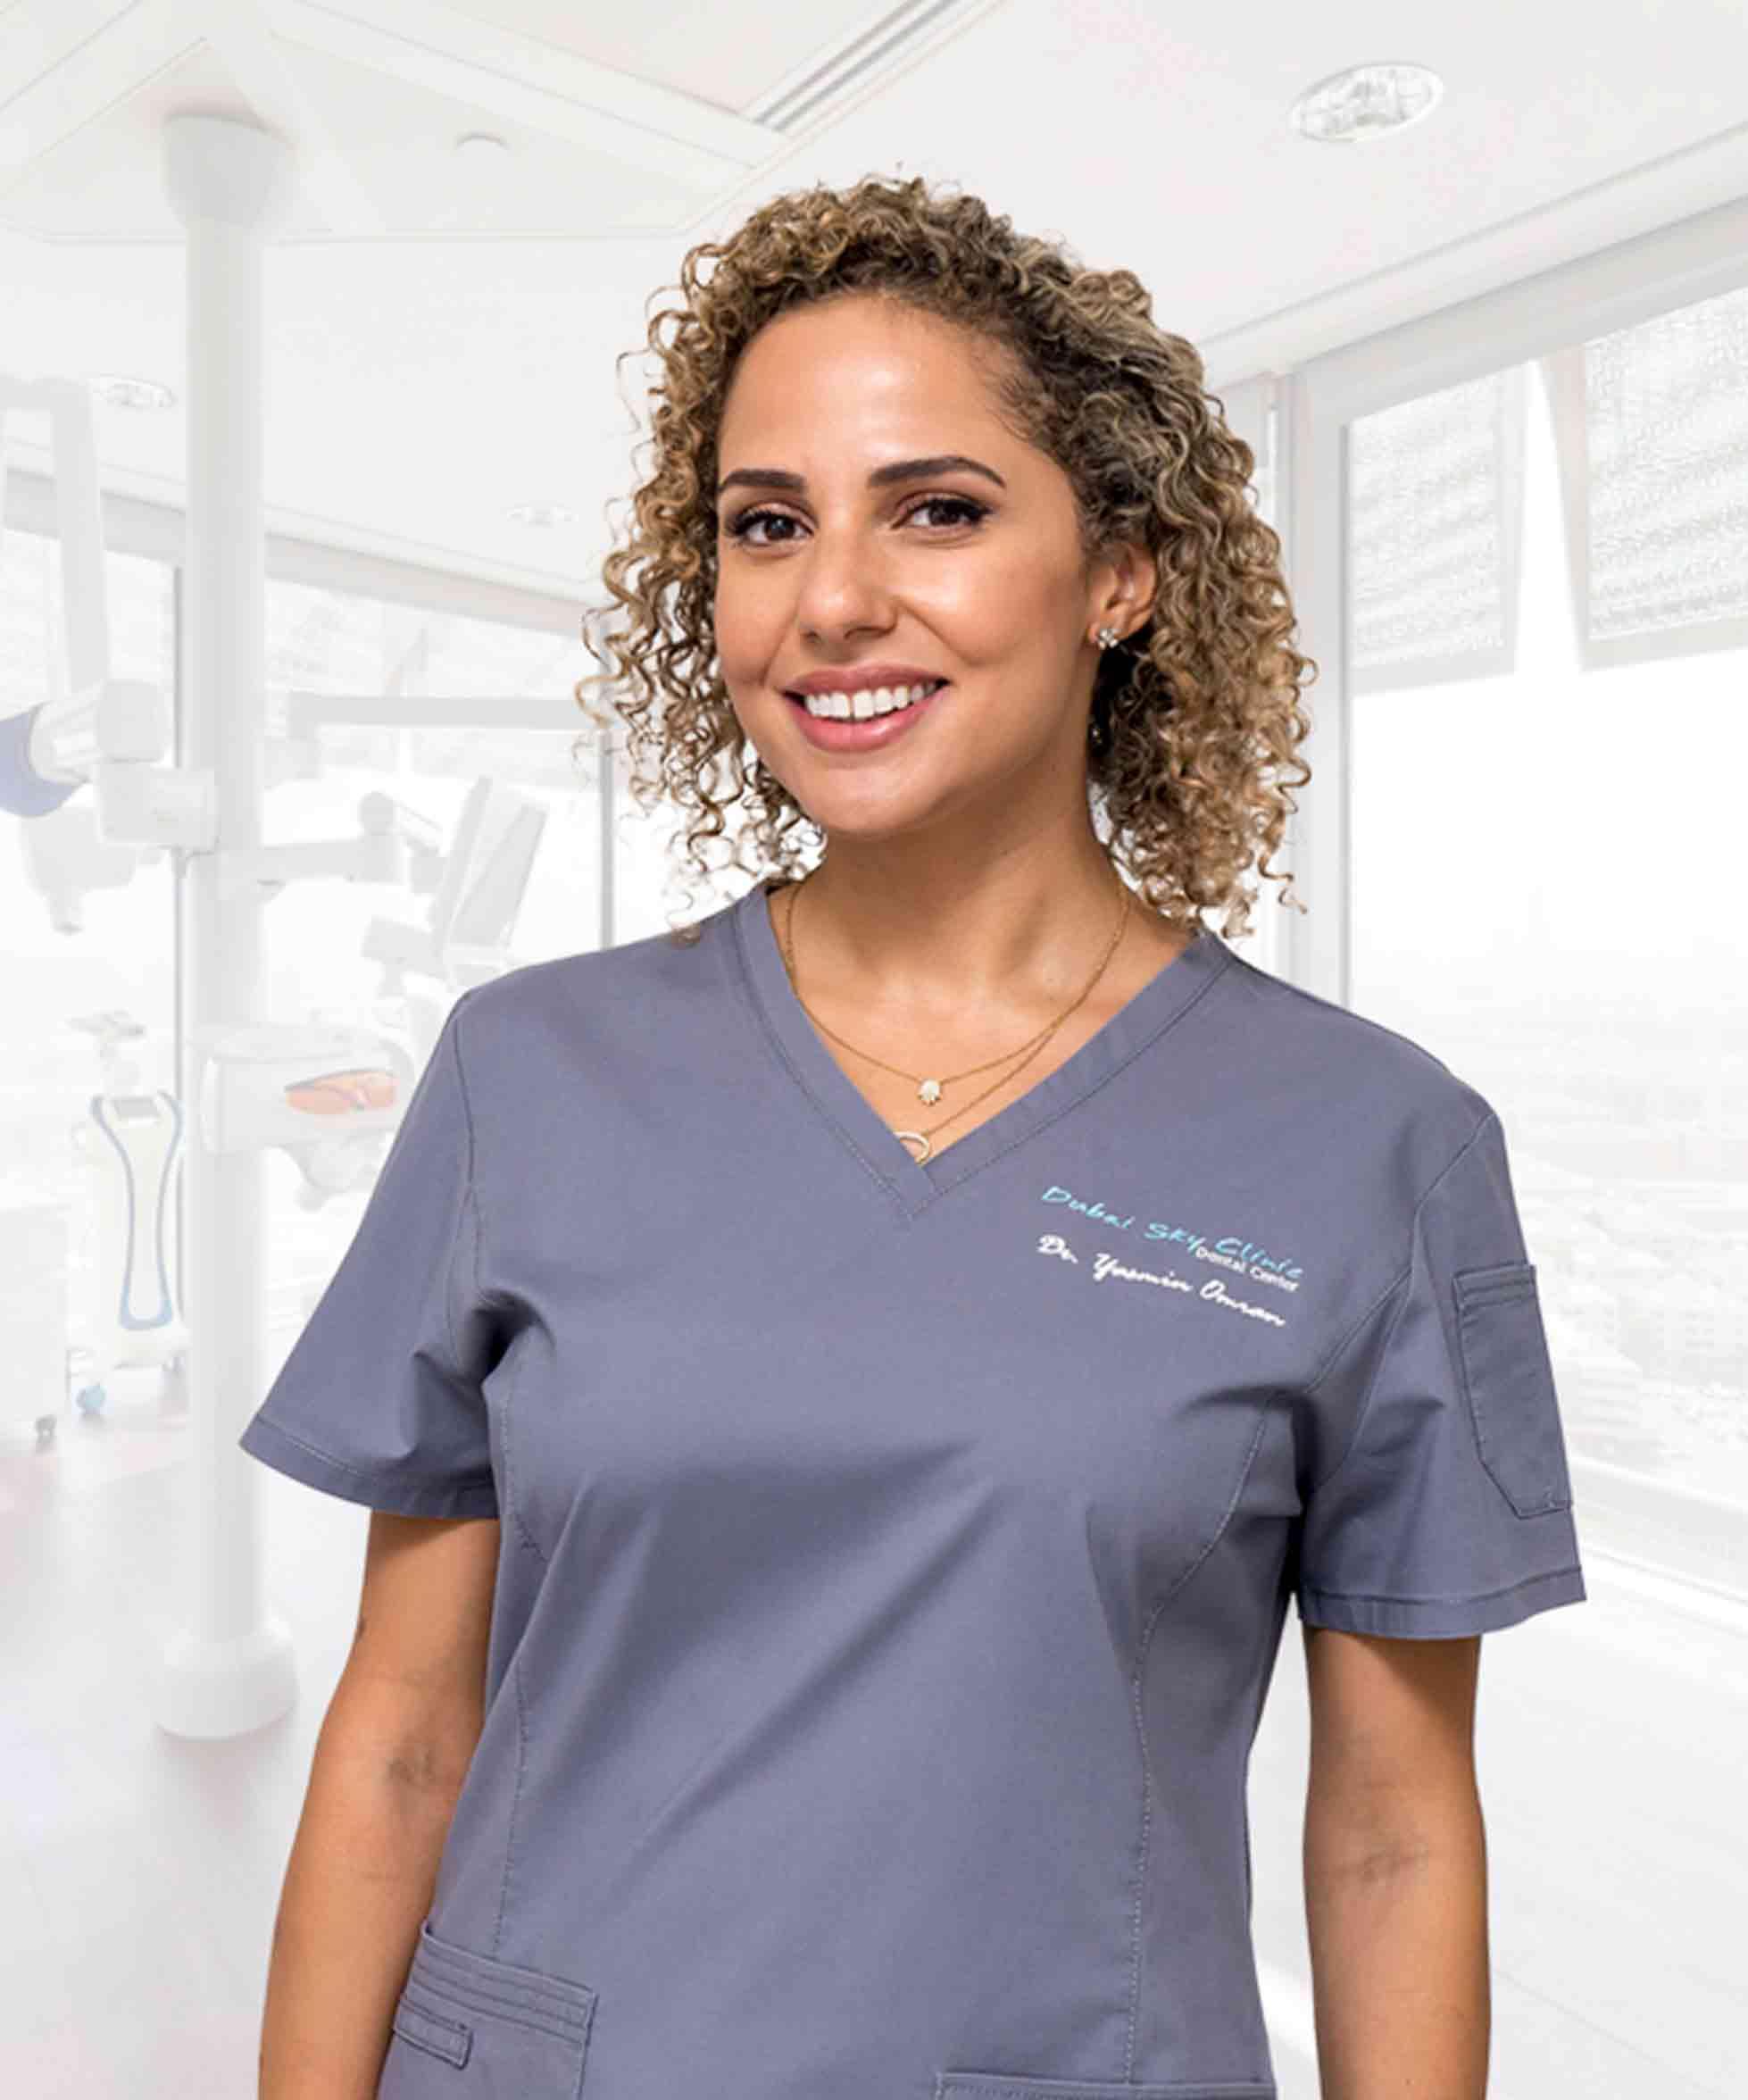 Dr. Yasmin Omran, General and Cosmetic Dentist